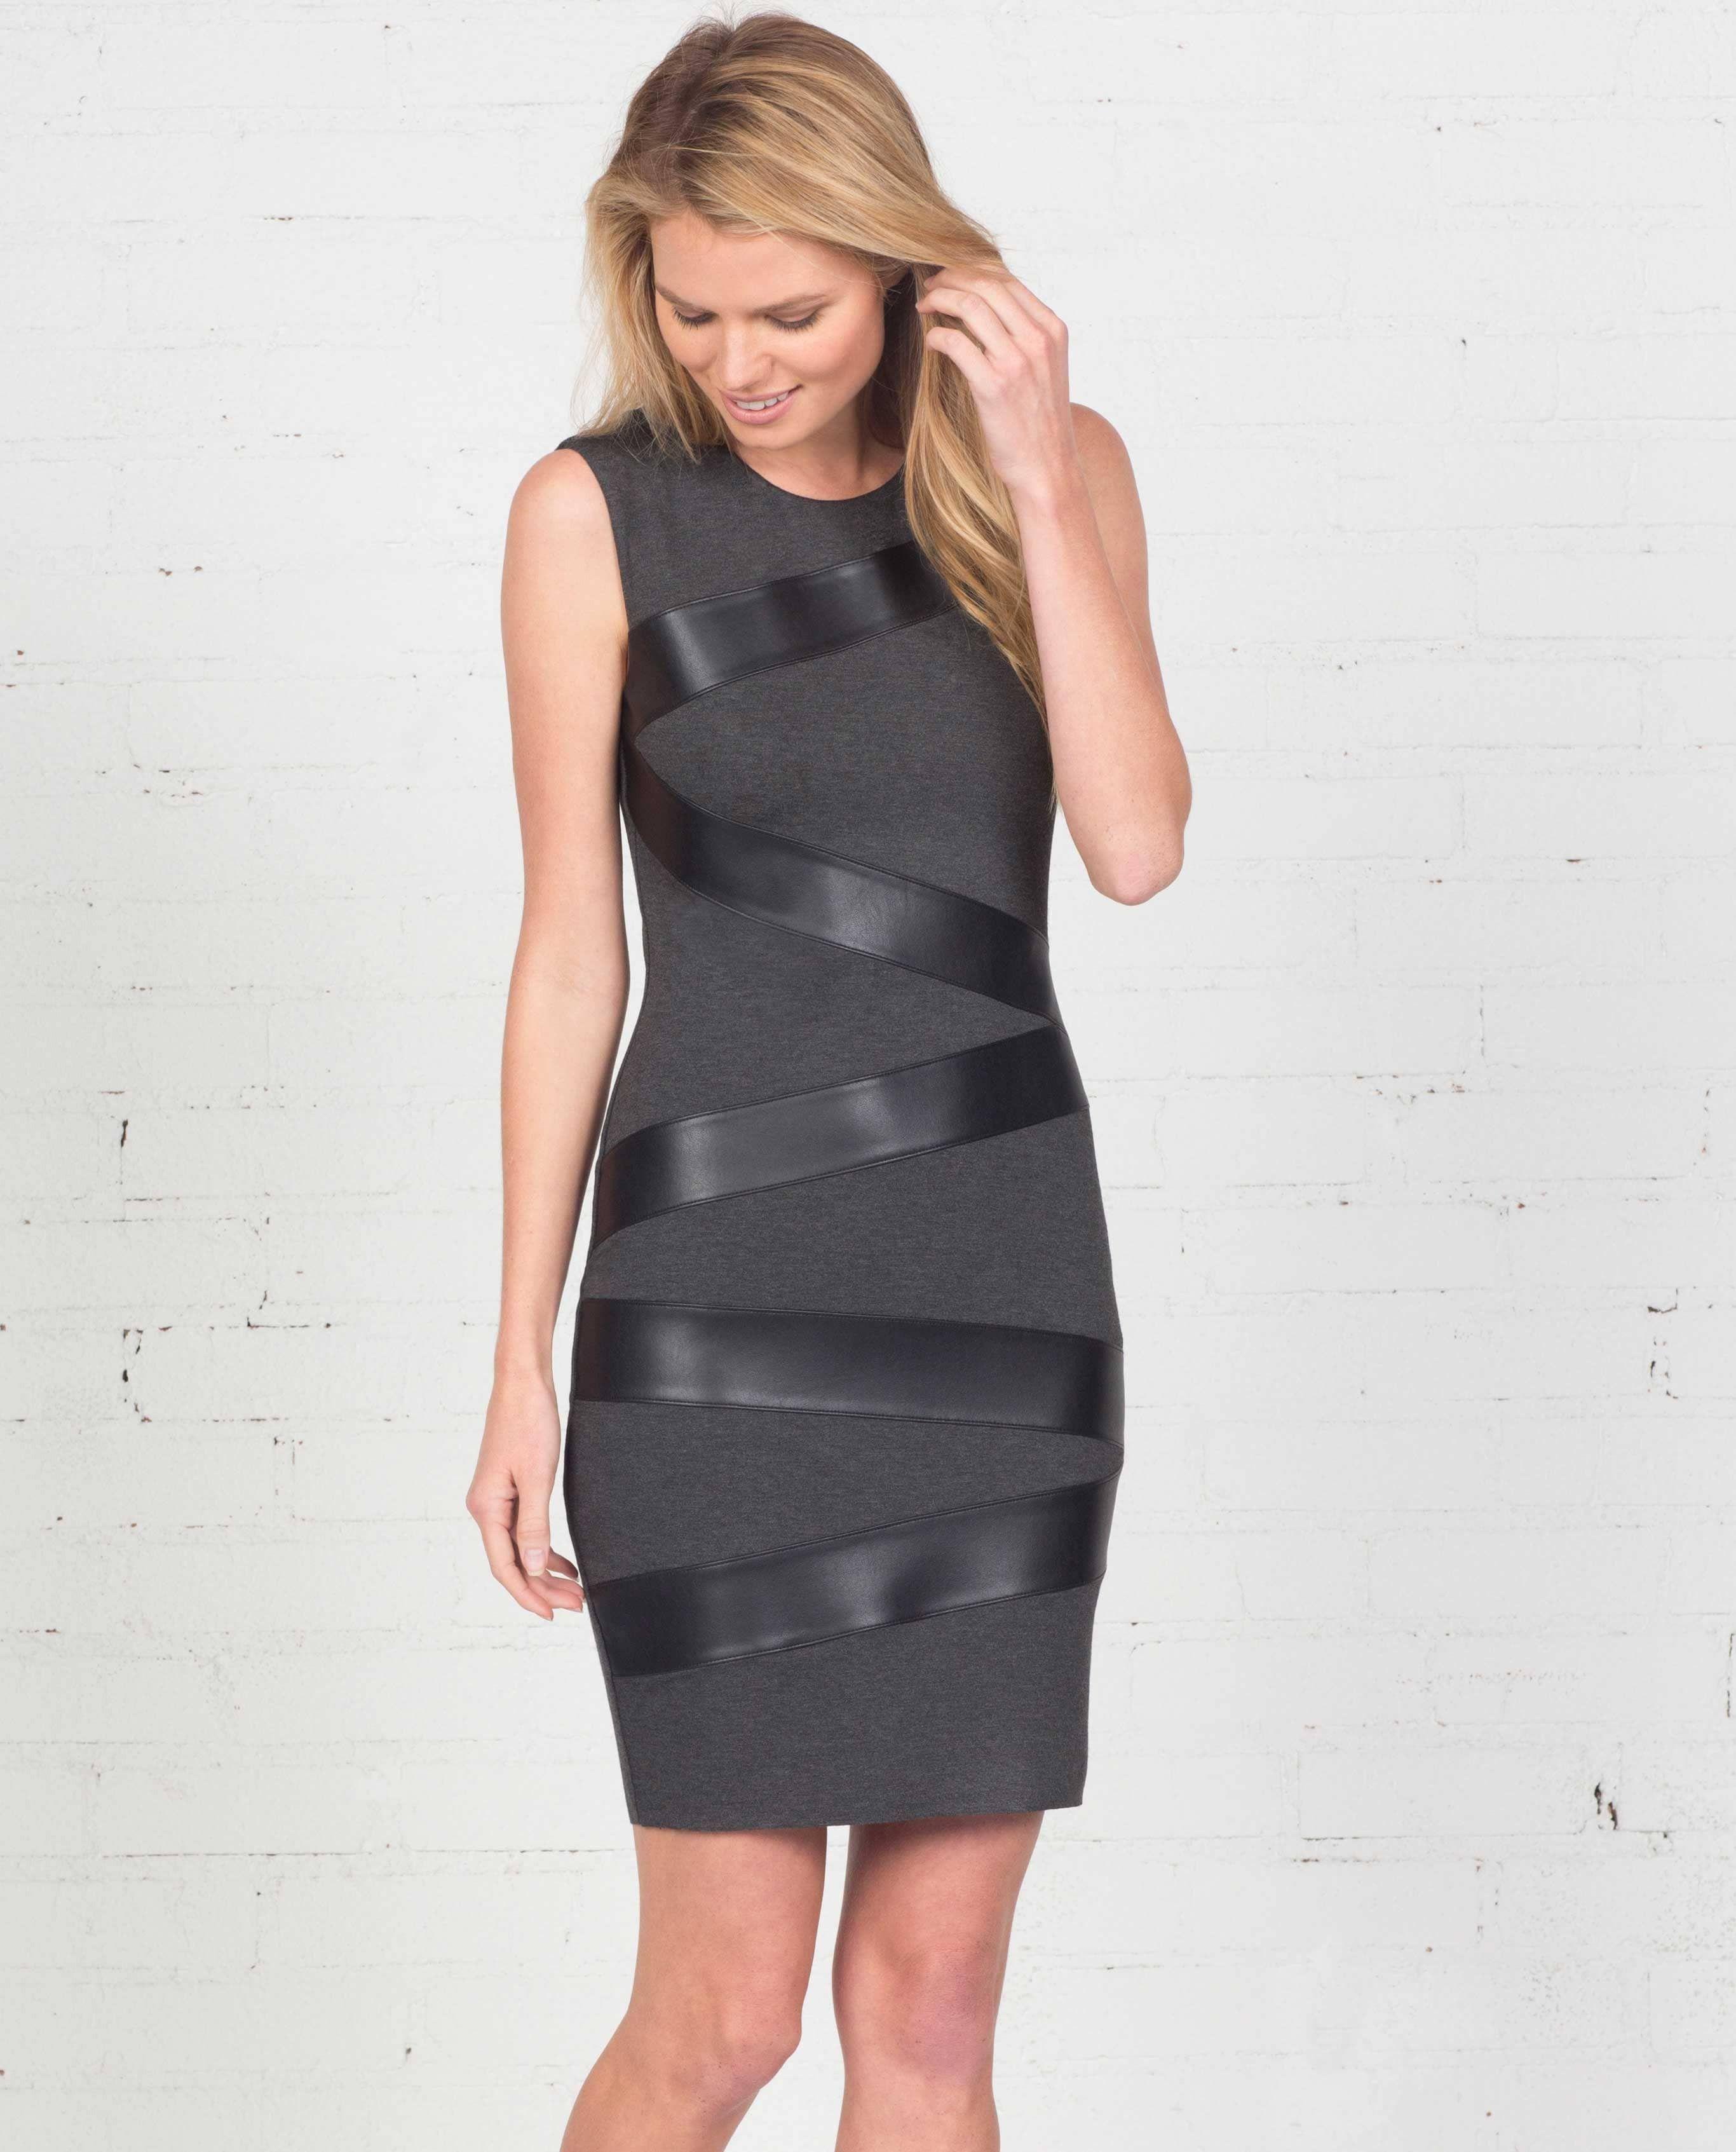 Spell bound dress my look sexy over pinterest black